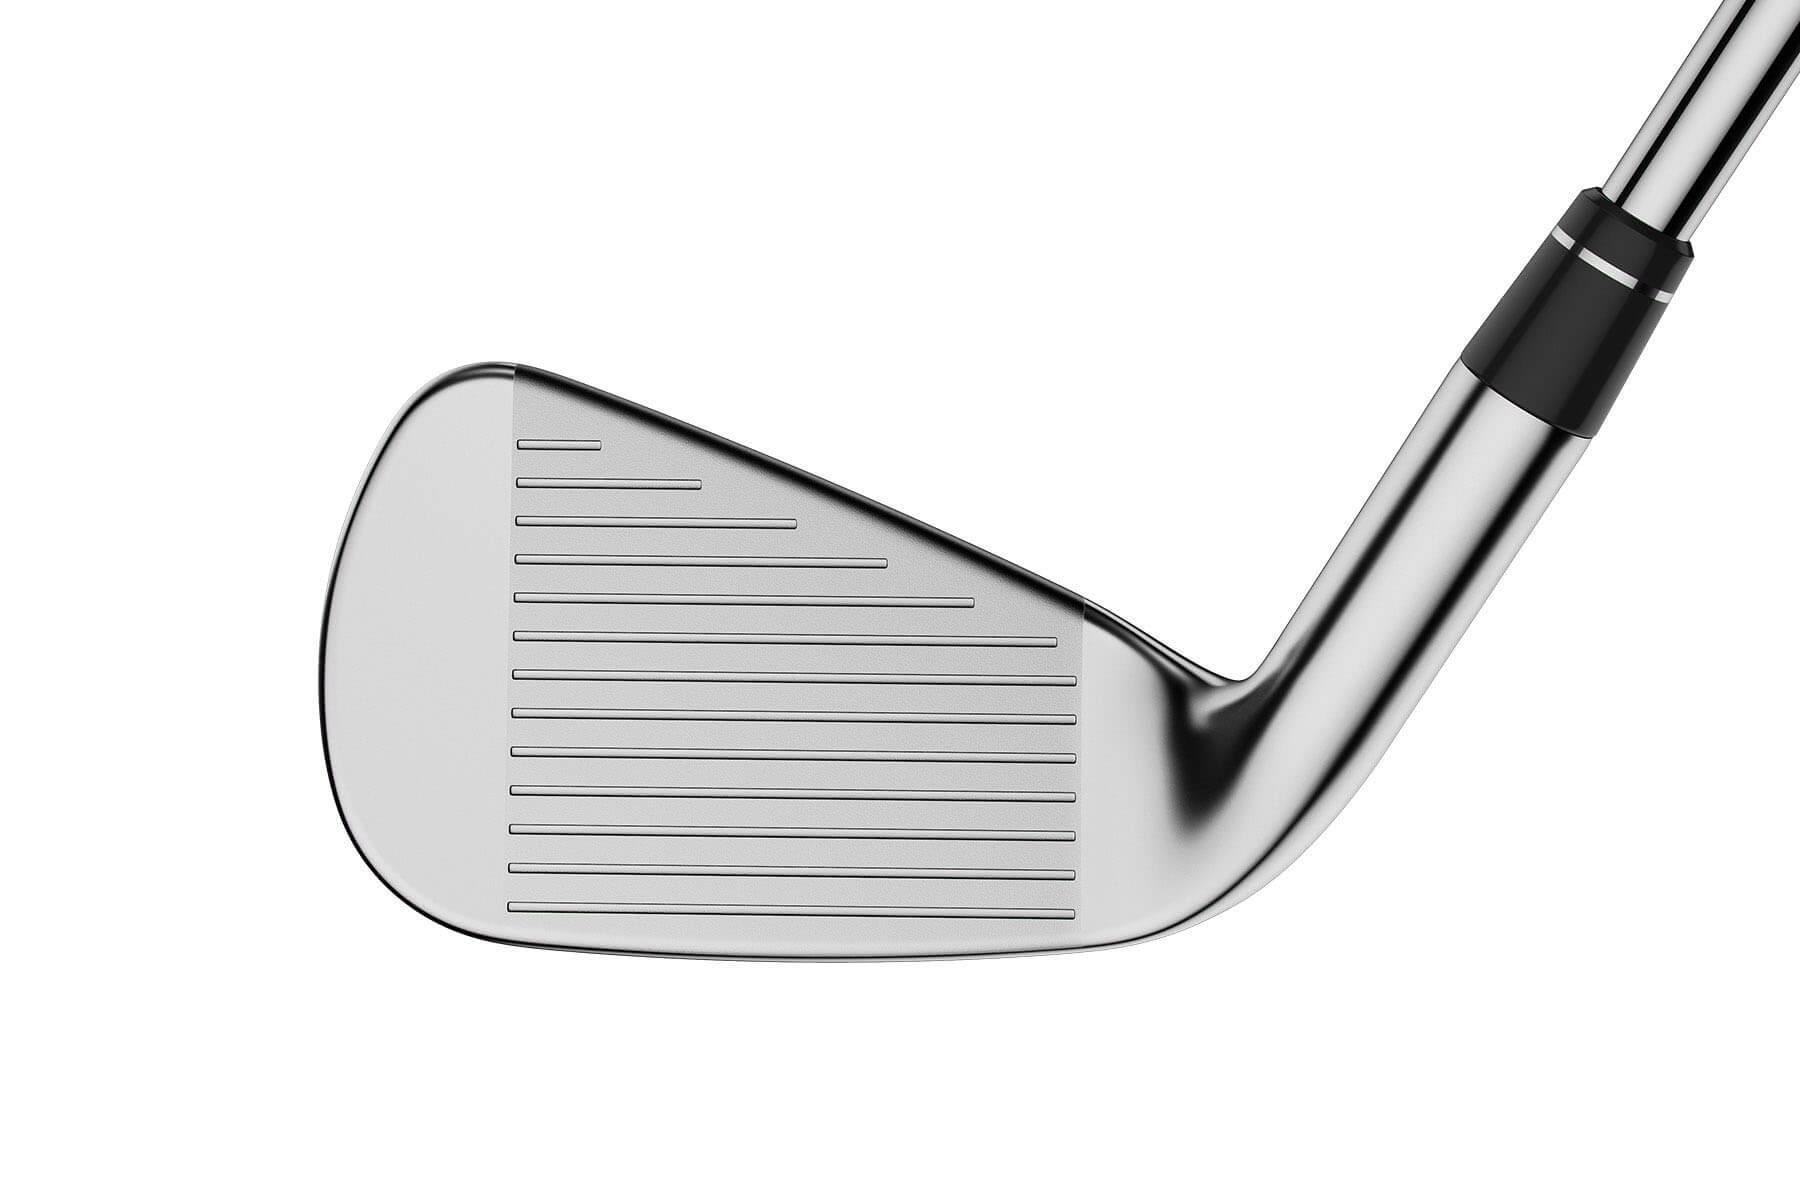 Callaway Golf GBB Epic Steel Irons